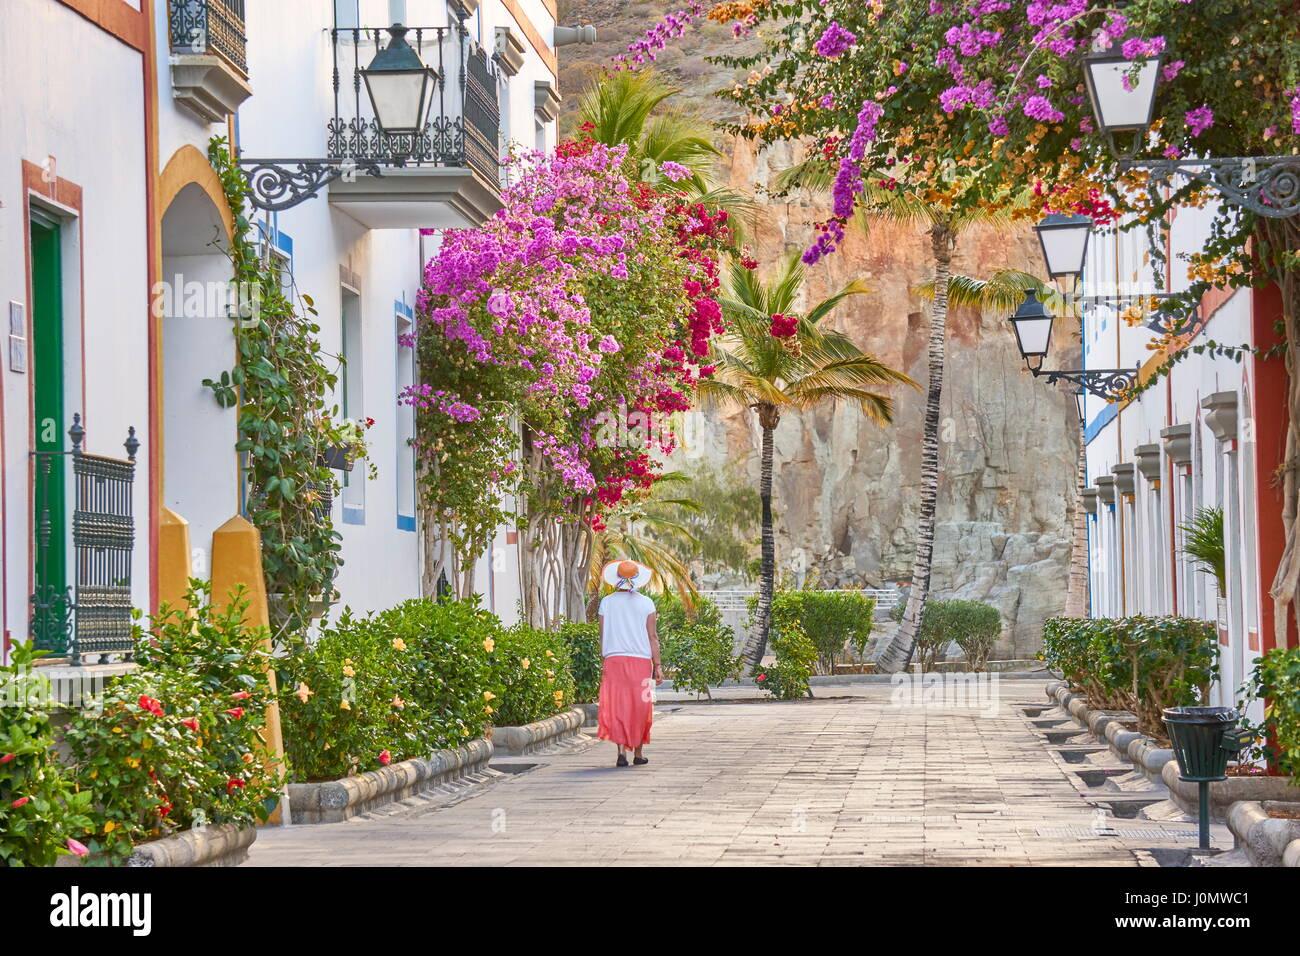 Blühende Blumen, Puerto de Mogan, Kanarische Inseln, Gran Canaria, Spanien Stockbild